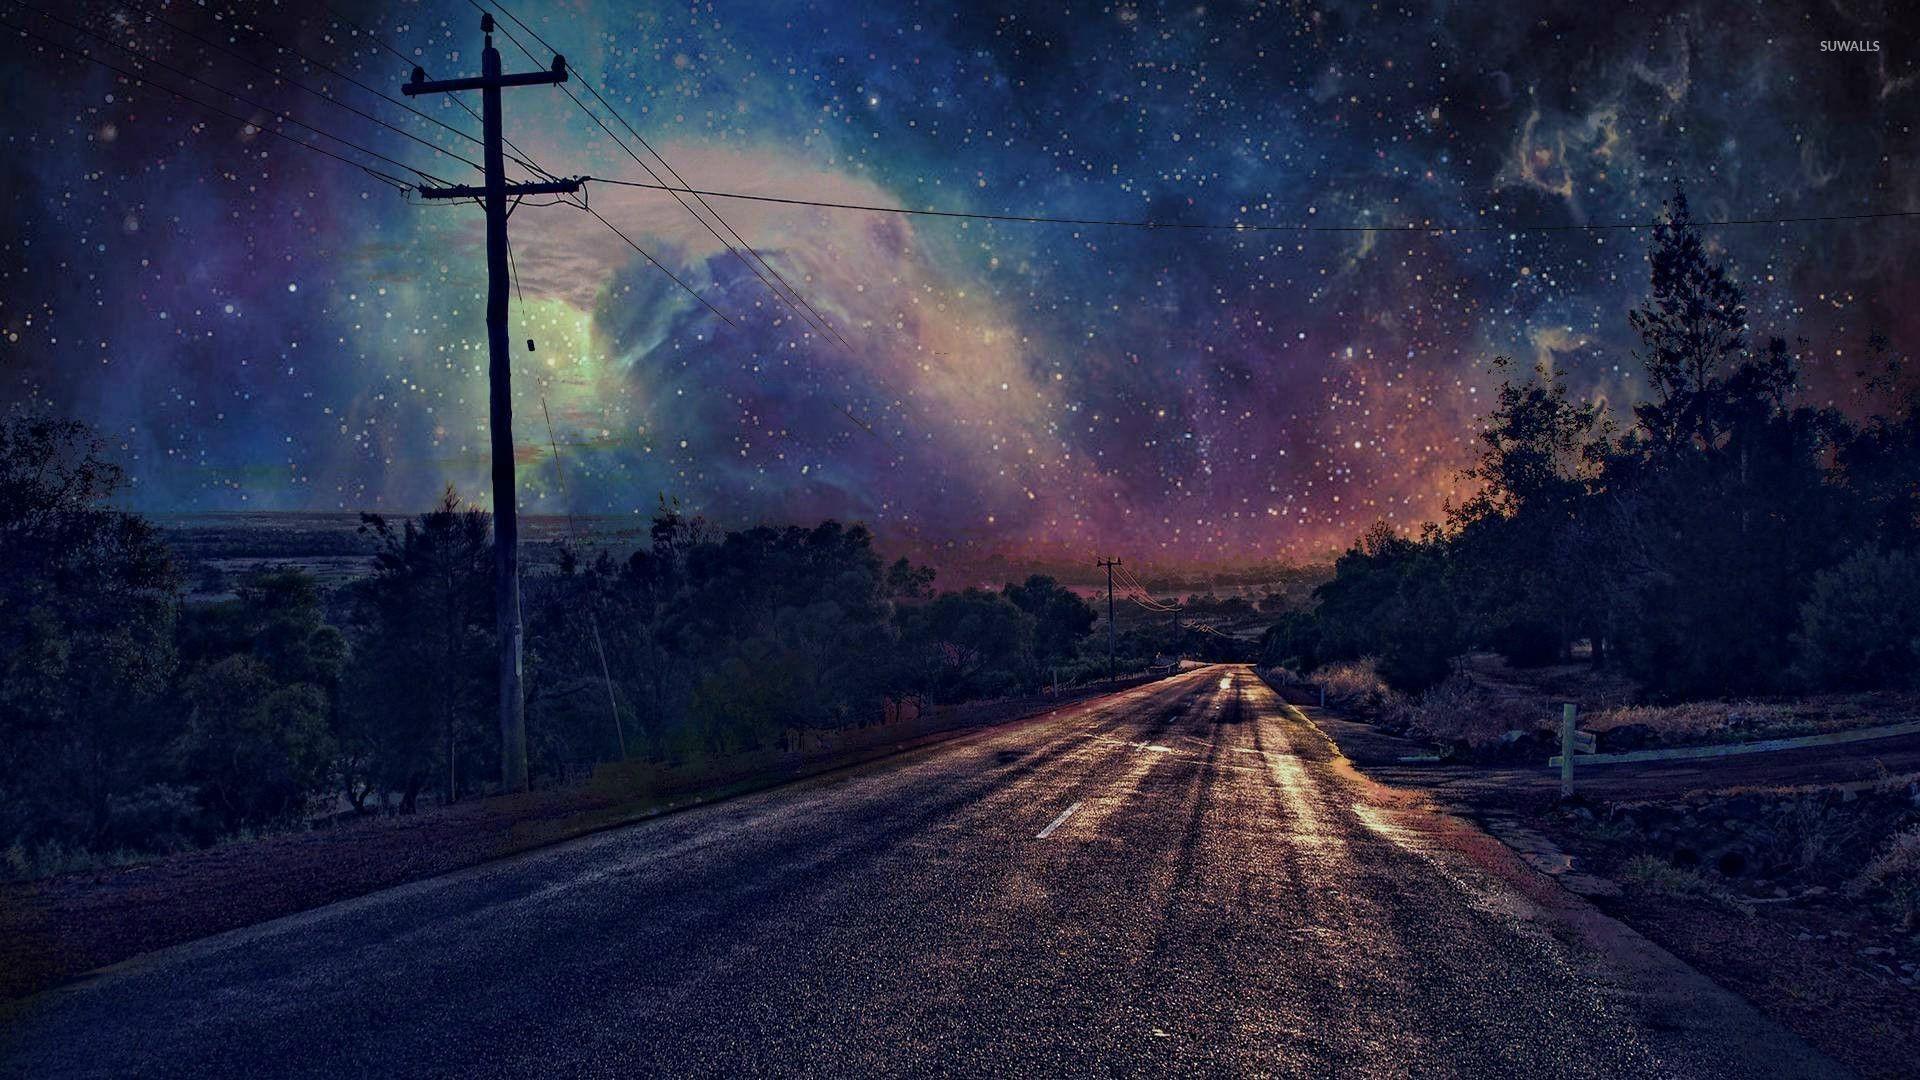 Nebula covered night sky wallpaper jpg